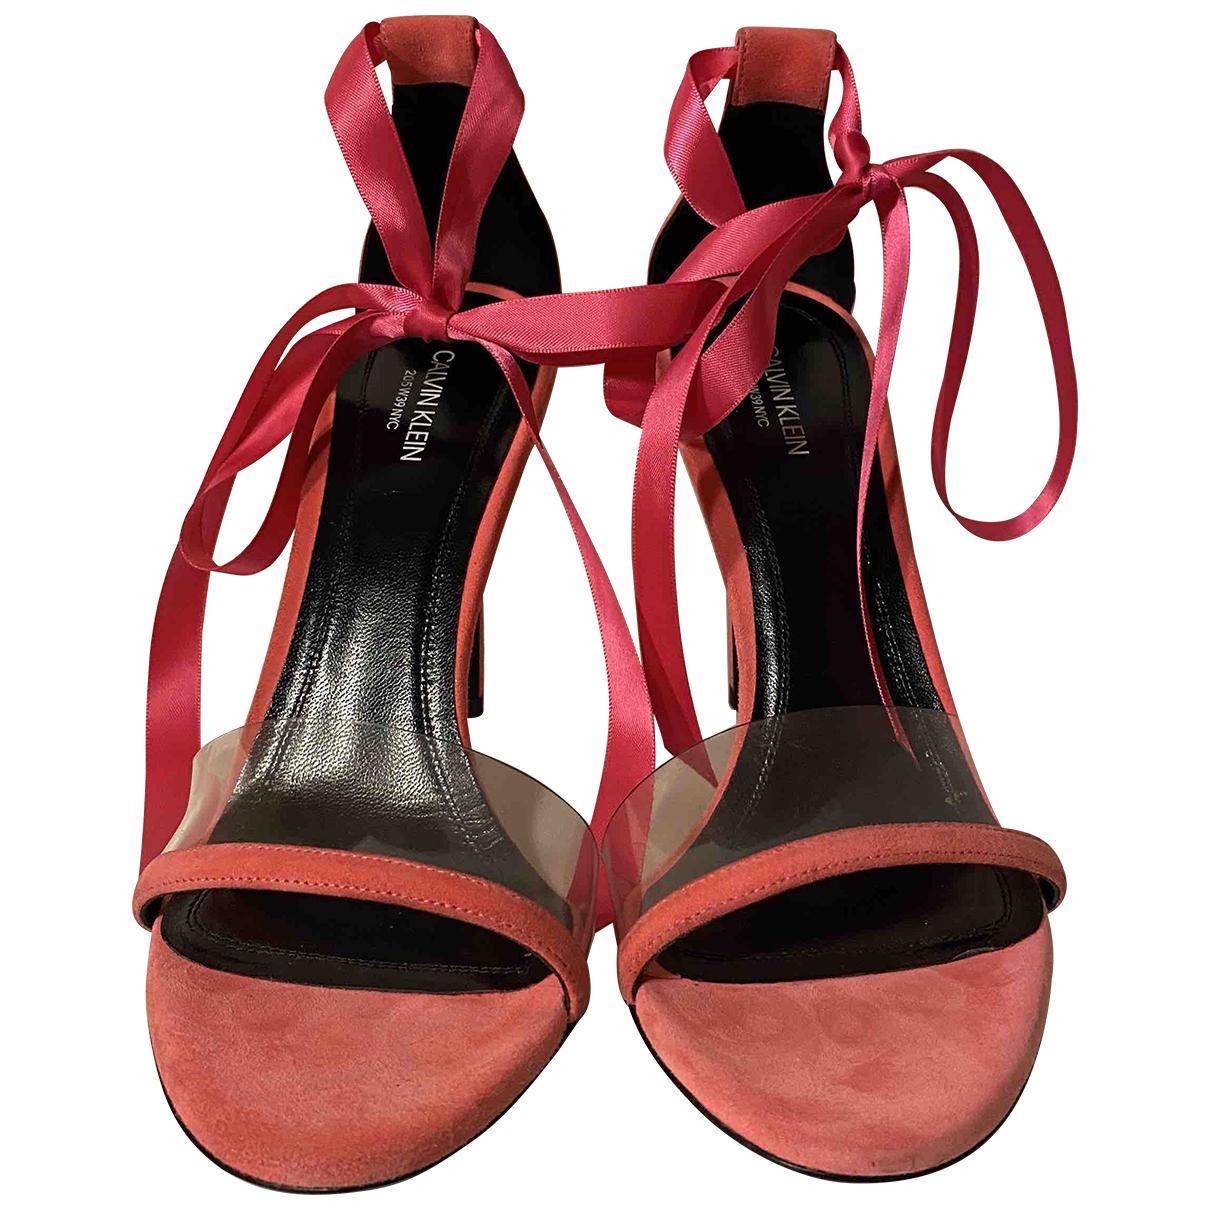 Calvin Klein 205w39nyc \N Pink Suede Sandals for Women 39 EU